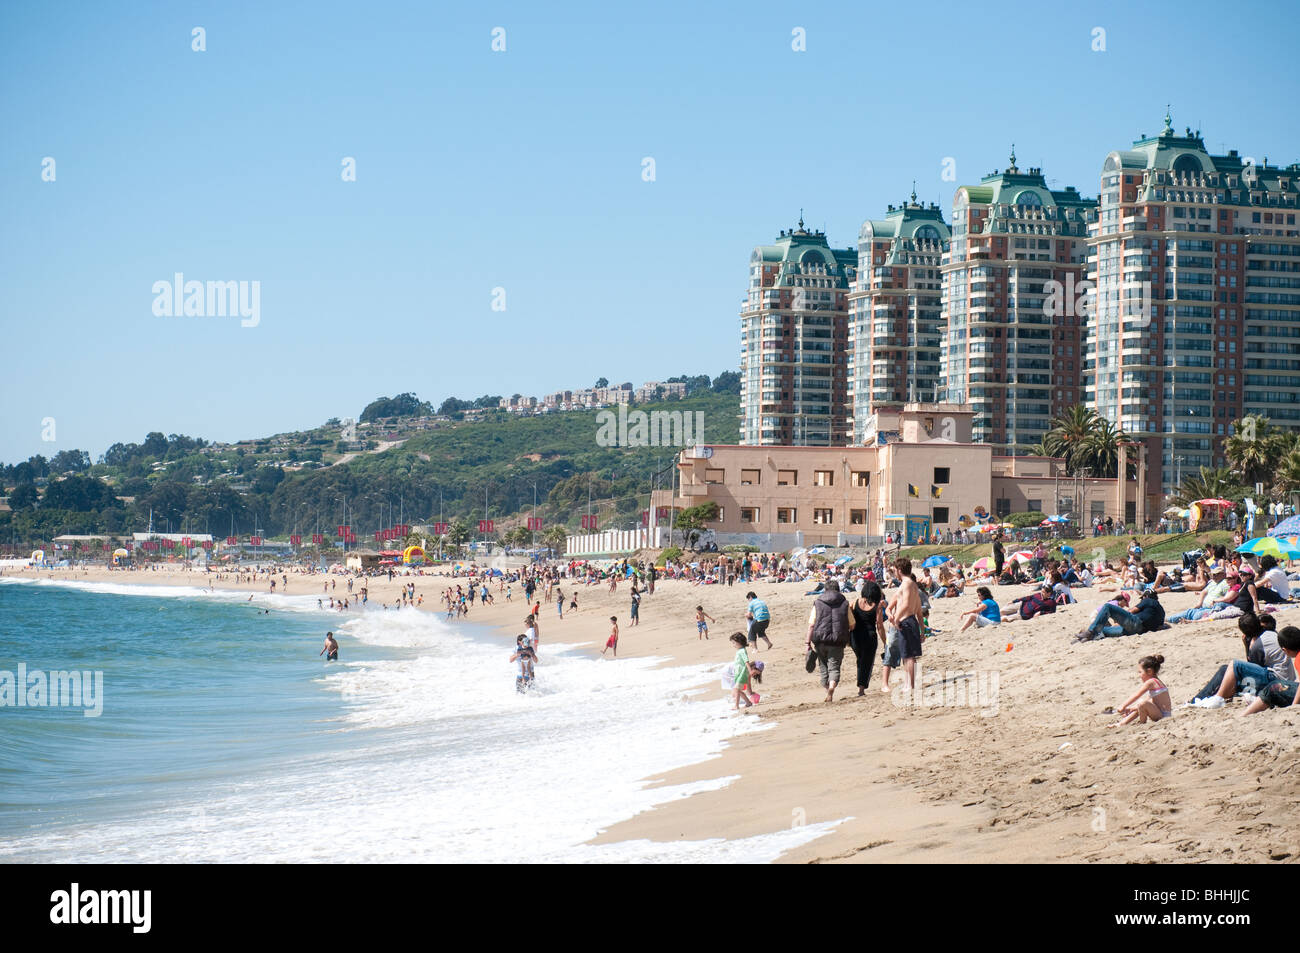 The beach front of Vina del Mar, Chile near Valparaiso - Stock Image